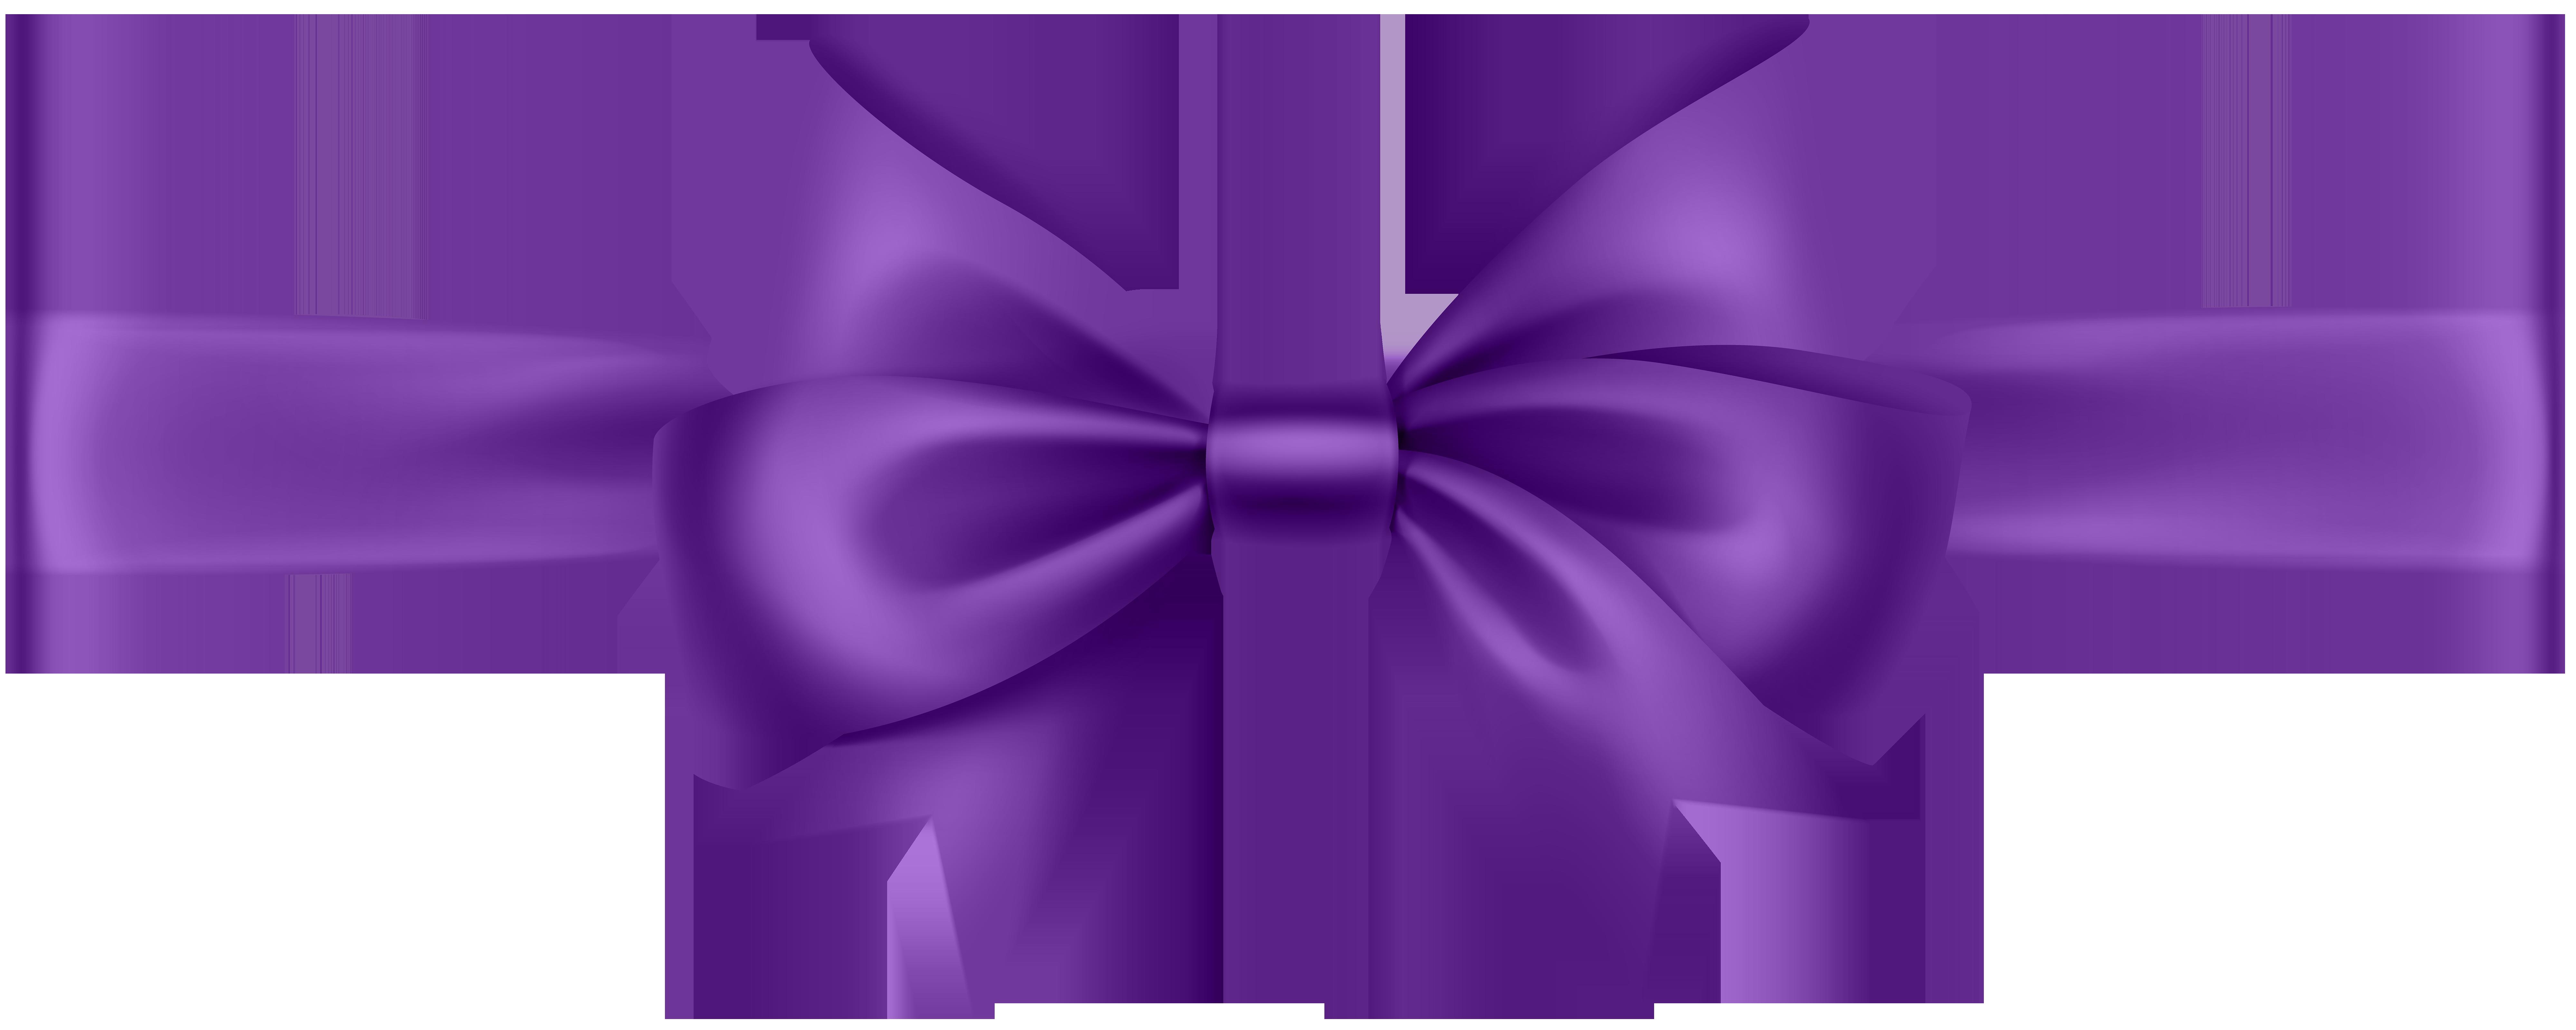 Green Ribbon Green Ribbon Clip Art Ribbon With Bow Purple Transparent Png Clip Art Image 8000 3199 Transprent Png Free D Clip Art Free Clip Art Purple Ribbon